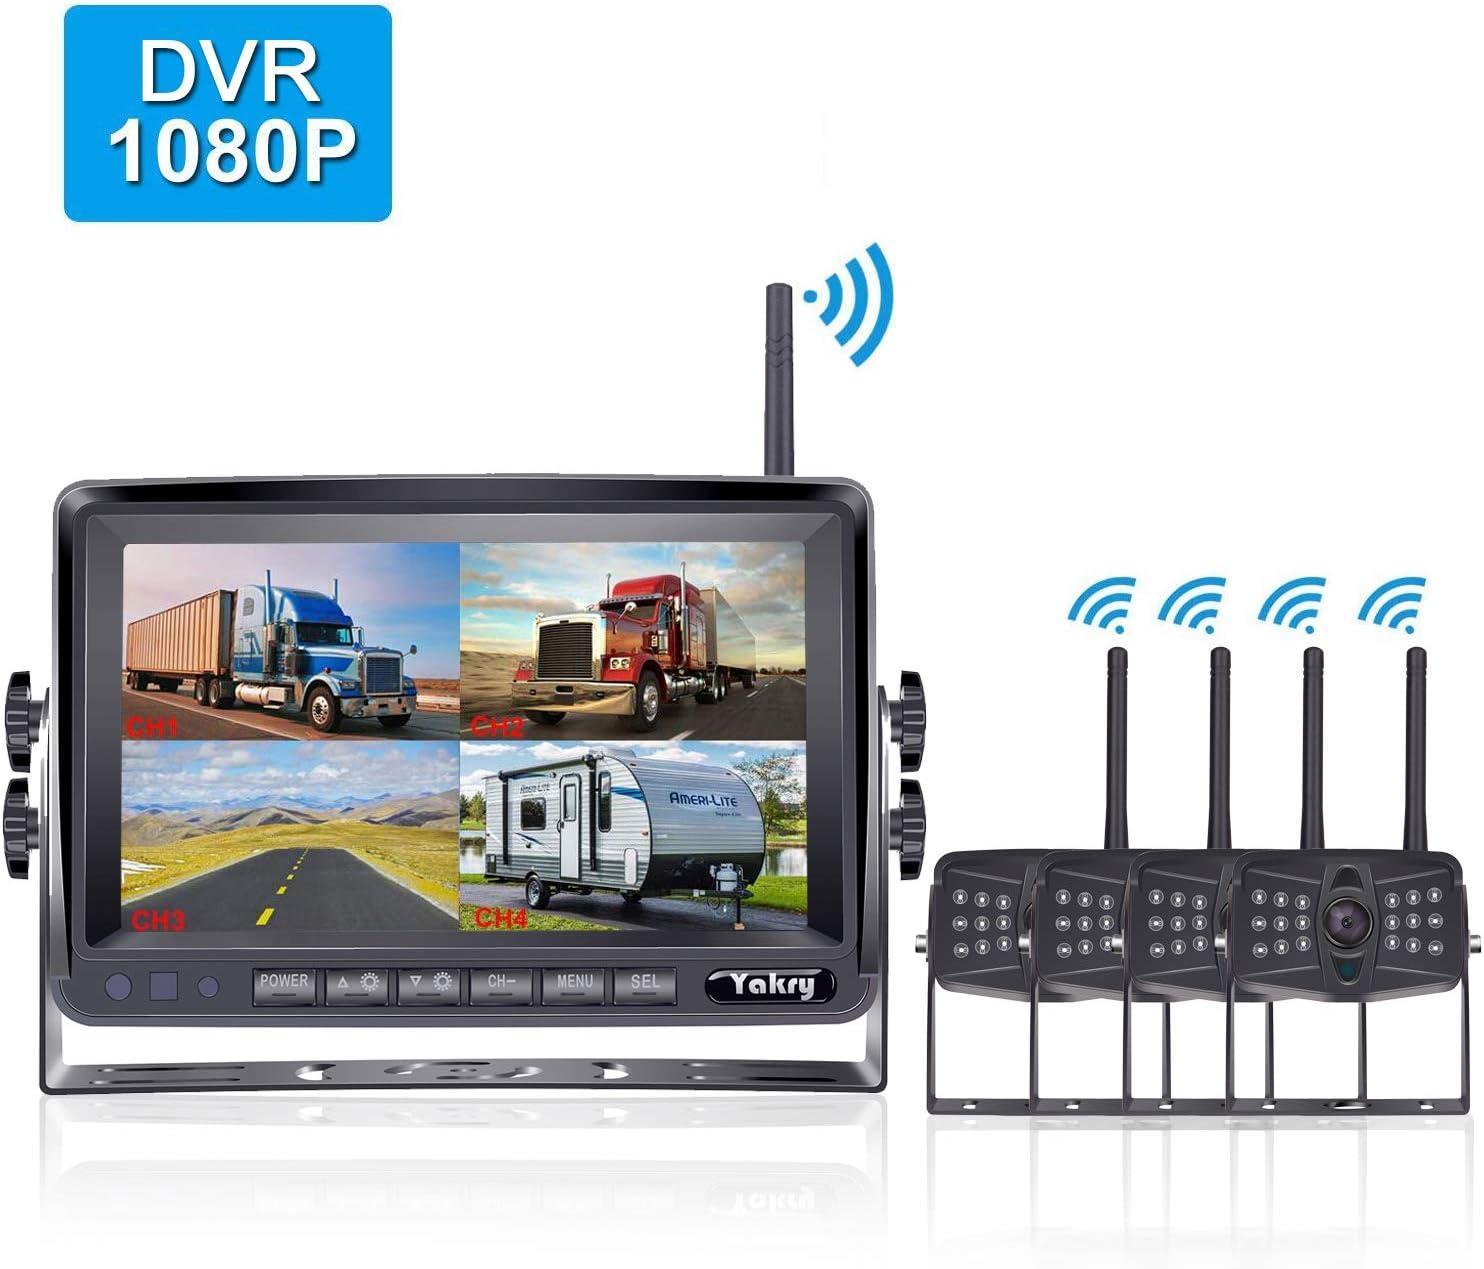 Yakry YA27S HD 1080P Digital Wireless 4 Backup Camera for RVs/Trailers/Trucks/Motorhomes/5th Wheels 7''Monitor with Highway Monitoring System IP69K Waterproof Super Night Vision